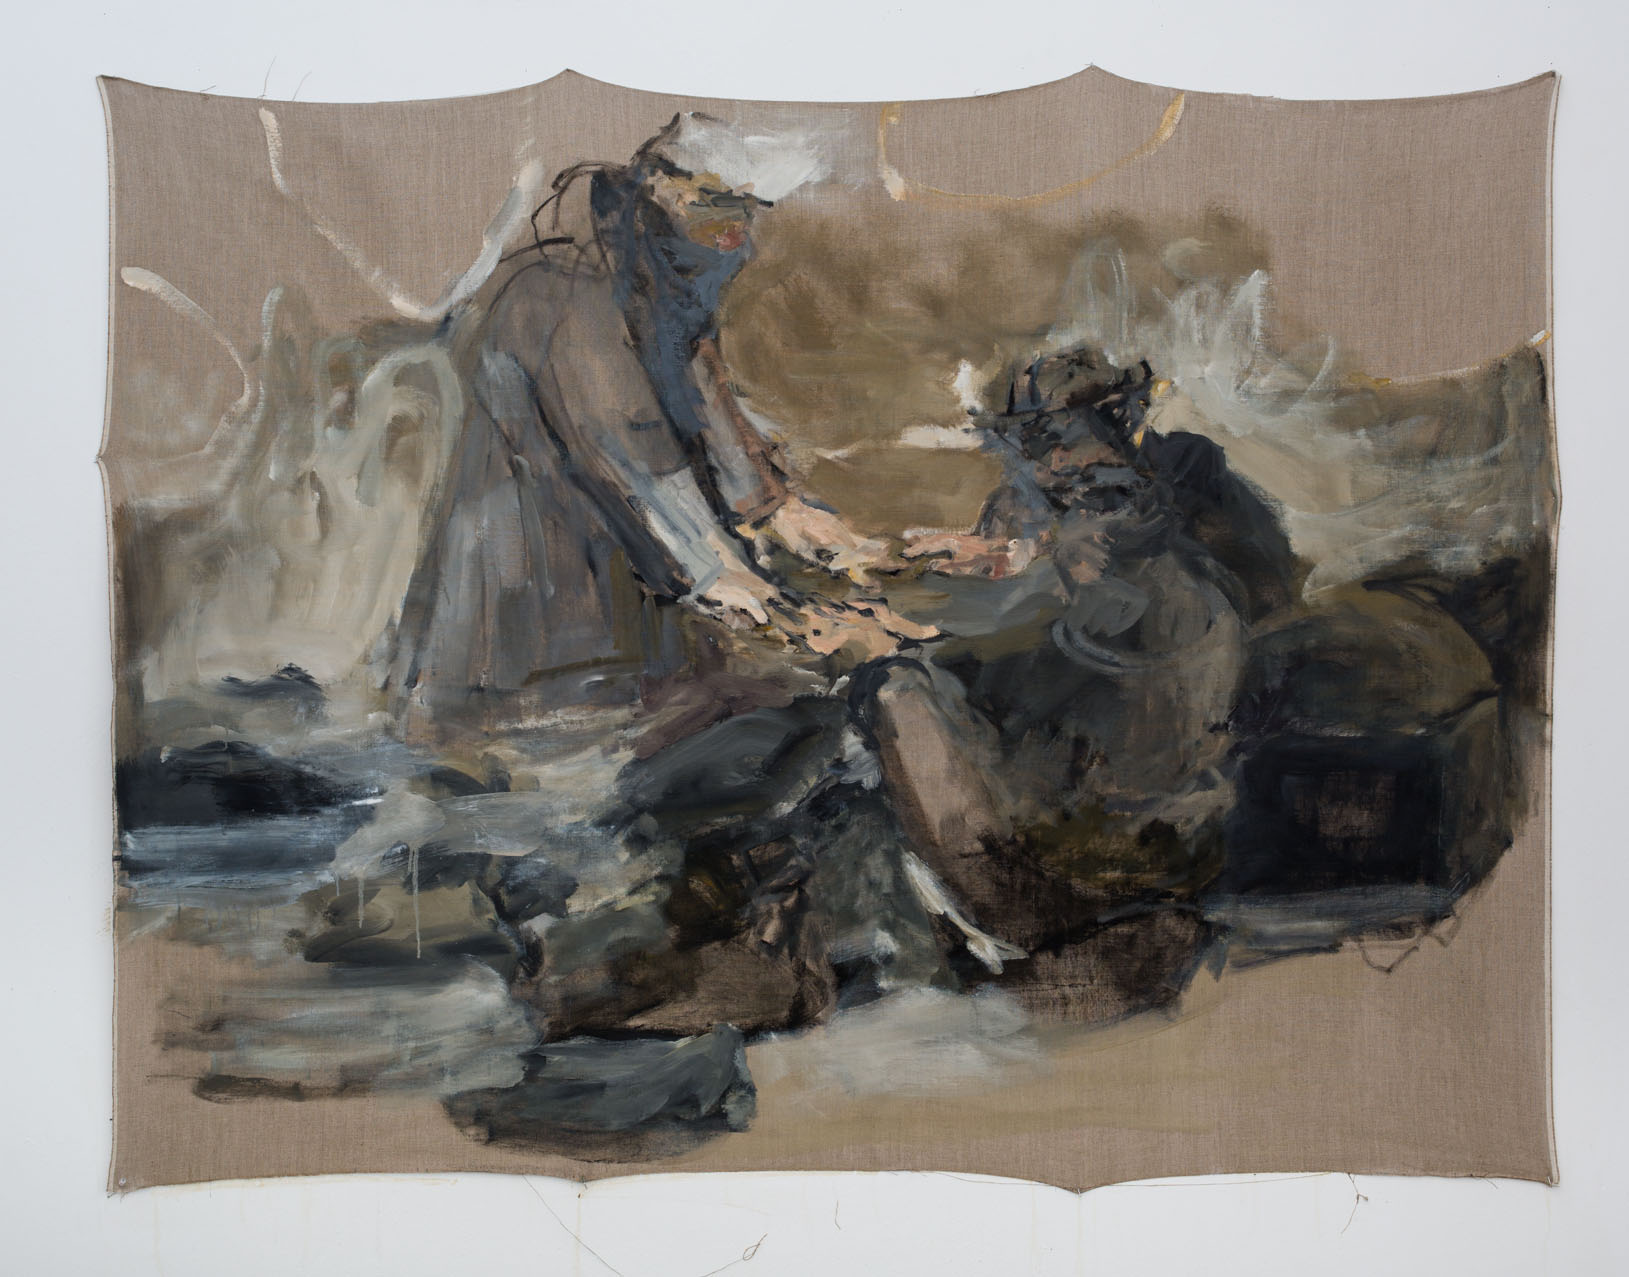 "Campfire III,  Oil on Linen, 60x 72"", 2016"